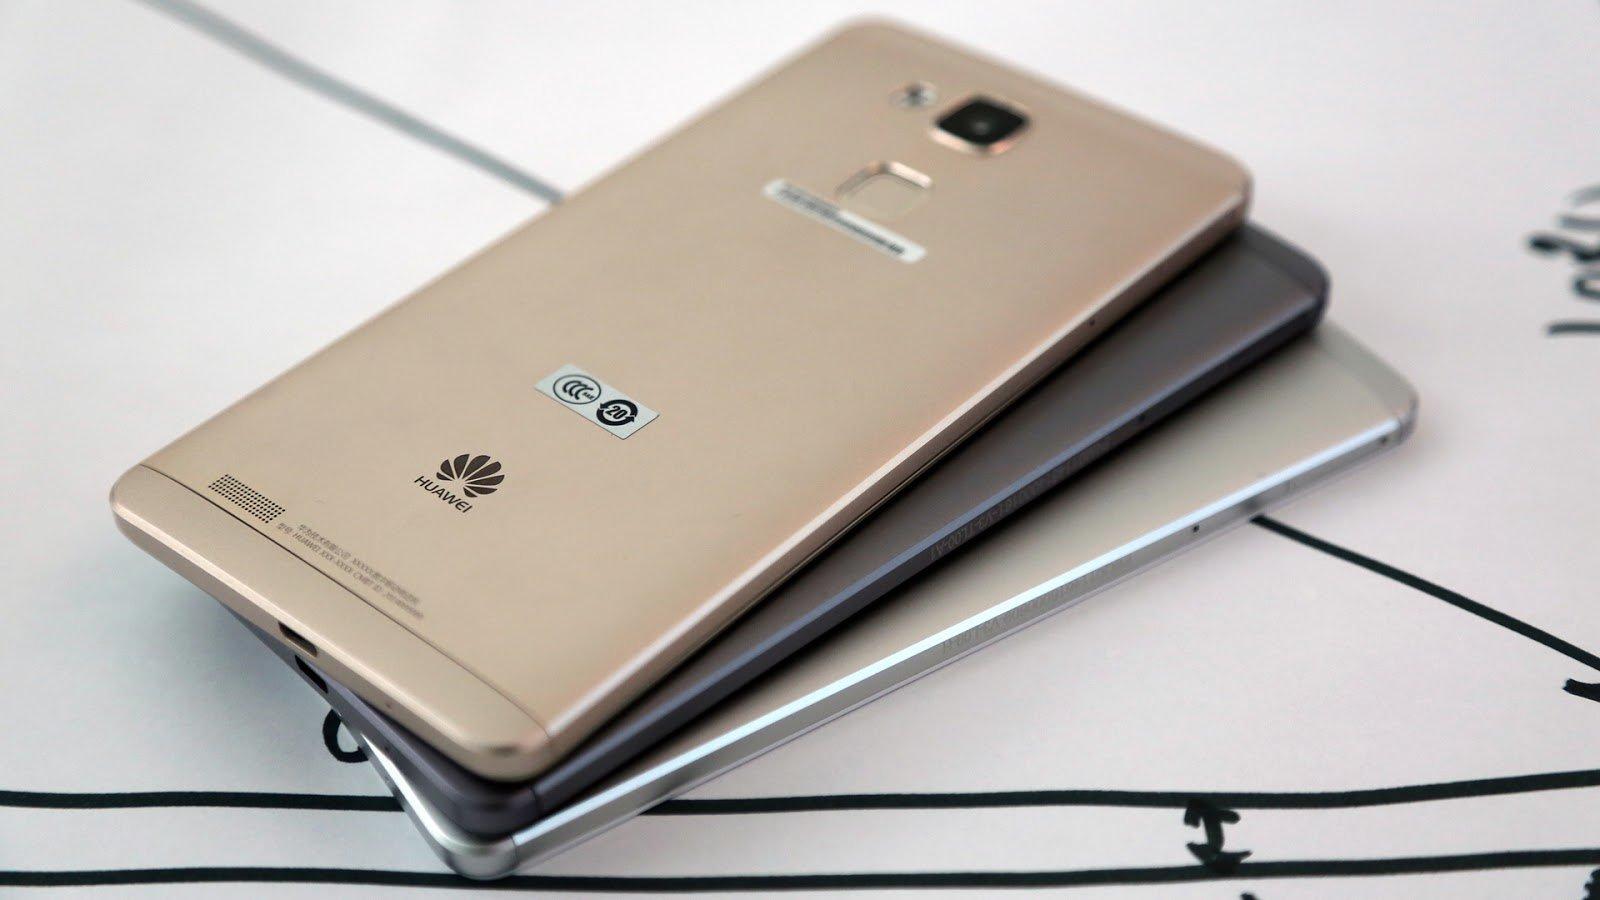 Huawei продала 100 млн. телефонов в 2018